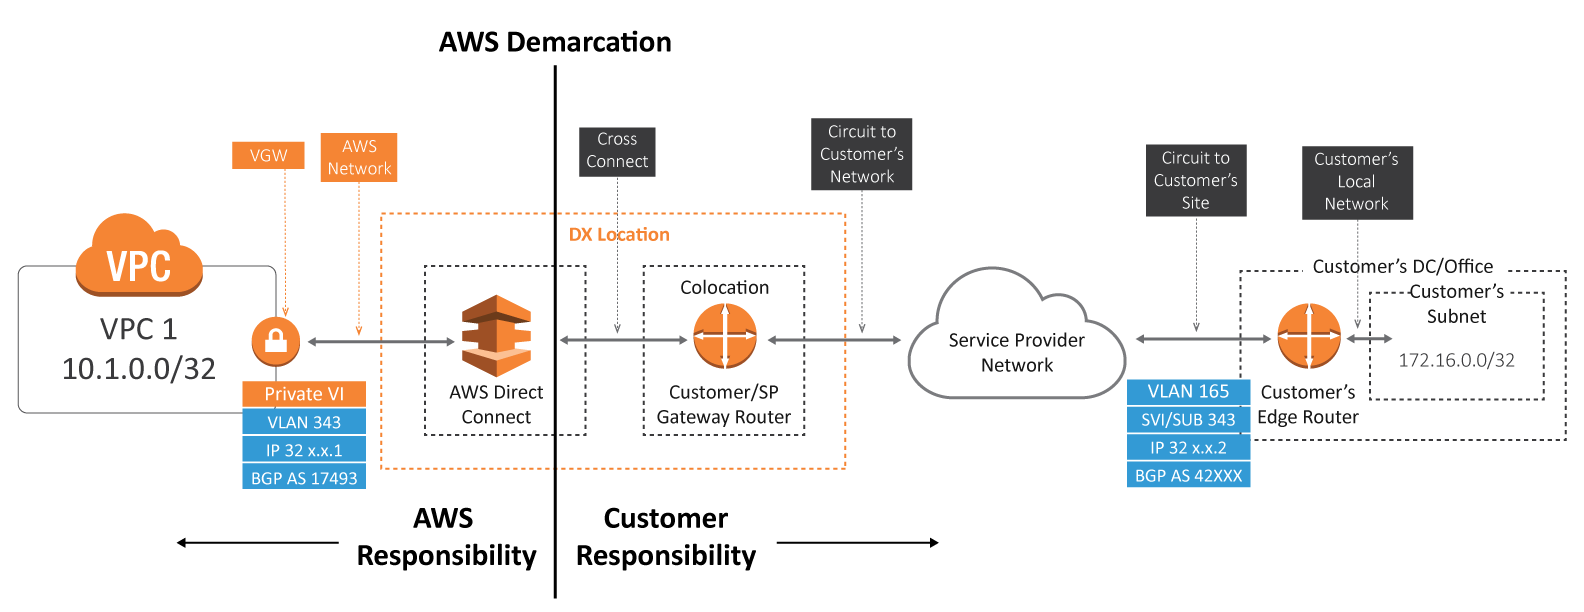 AWS-Direct-Connect-Diagram